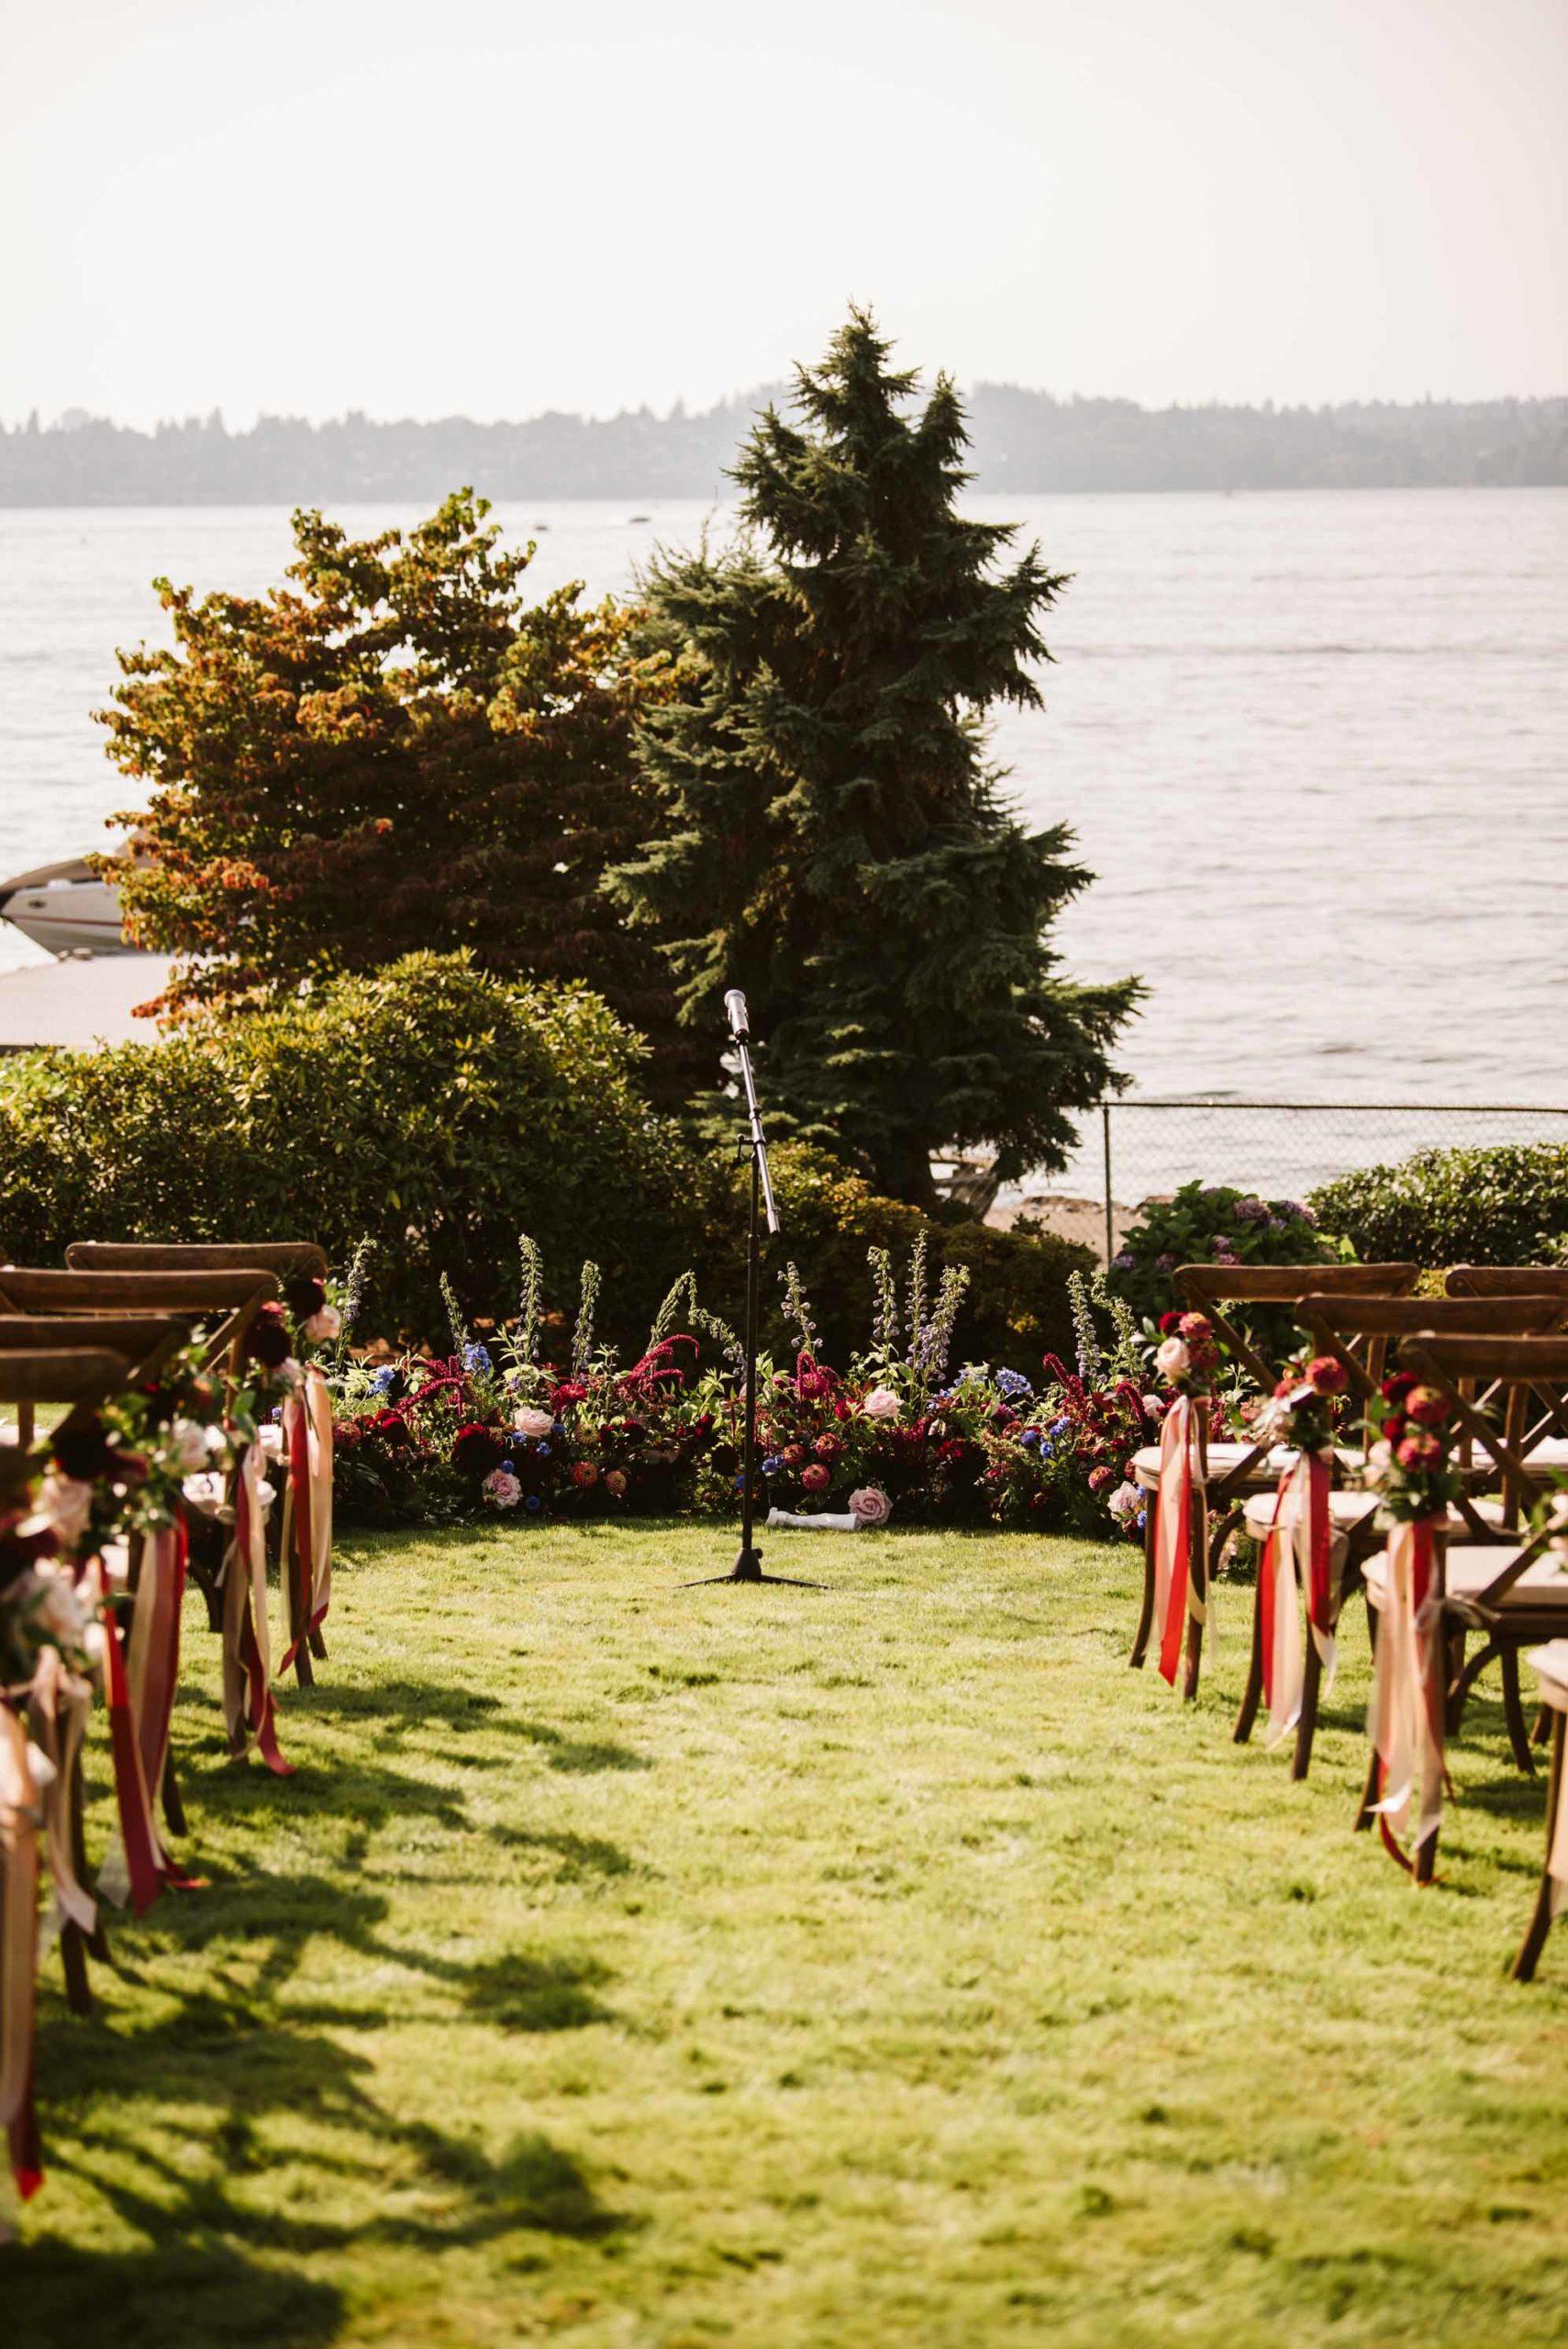 Outdoor summer wedding ceremony on the lawn of brides family home on Lake Washington | Flora Nova Design Seattle